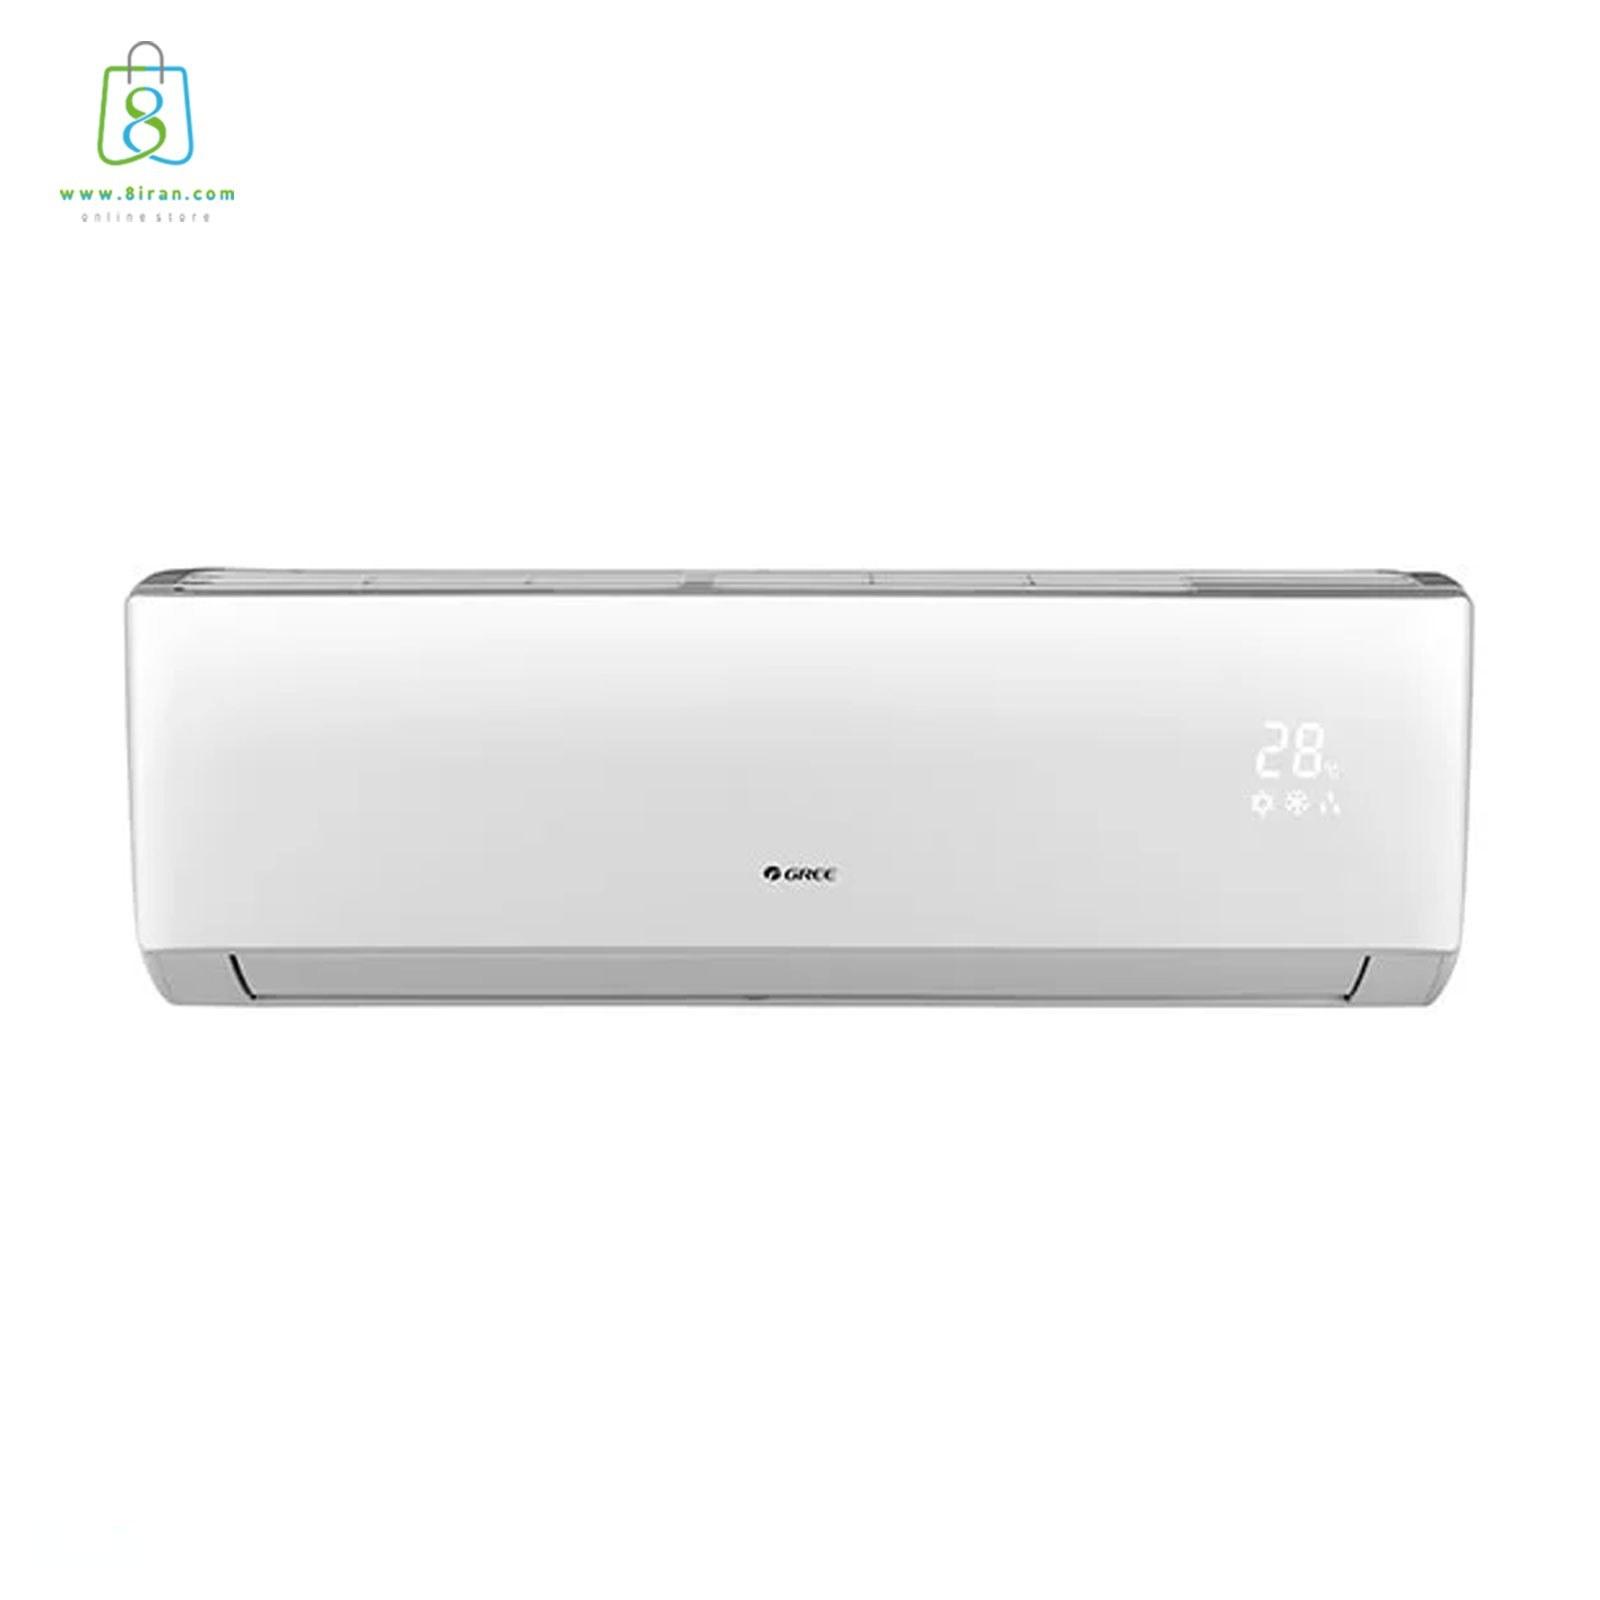 تصویر کولر گازی اسپلیت گری مدل  G4 Matic-H30C3 GREE Air Conditioner G4 Matic-H30C3